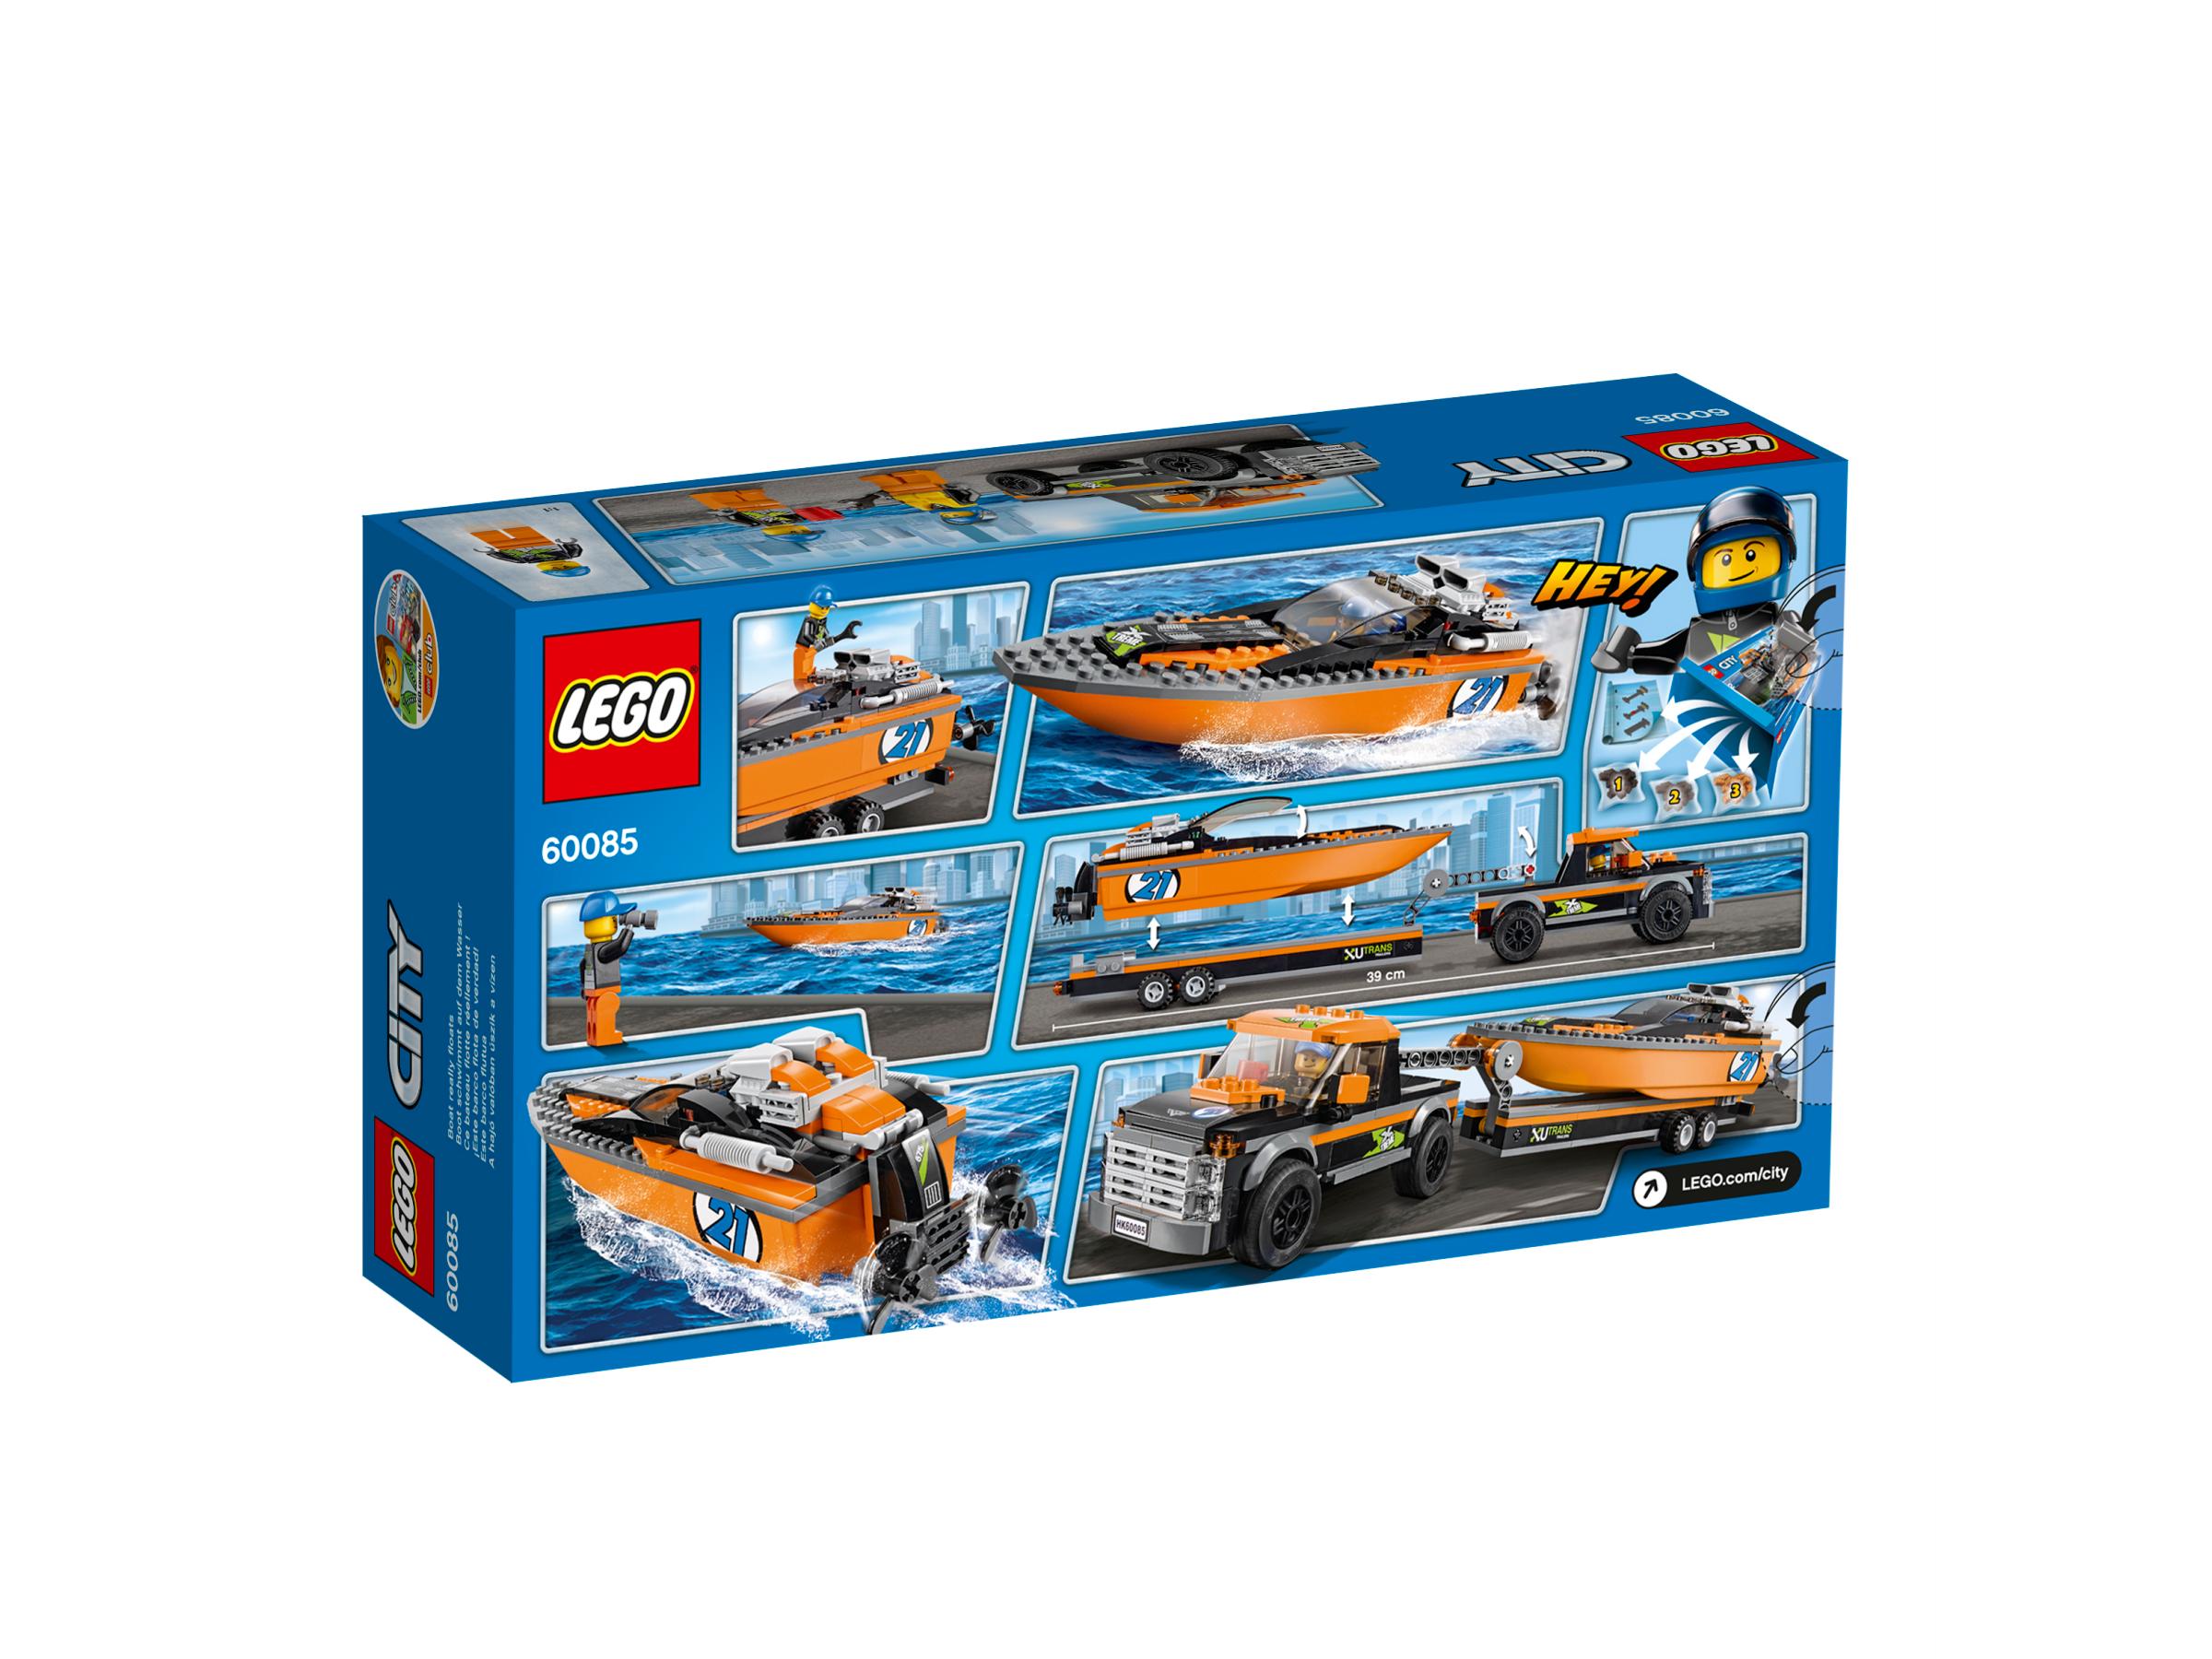 LEGO City Allradfahrzeug mit Powerboot 60085